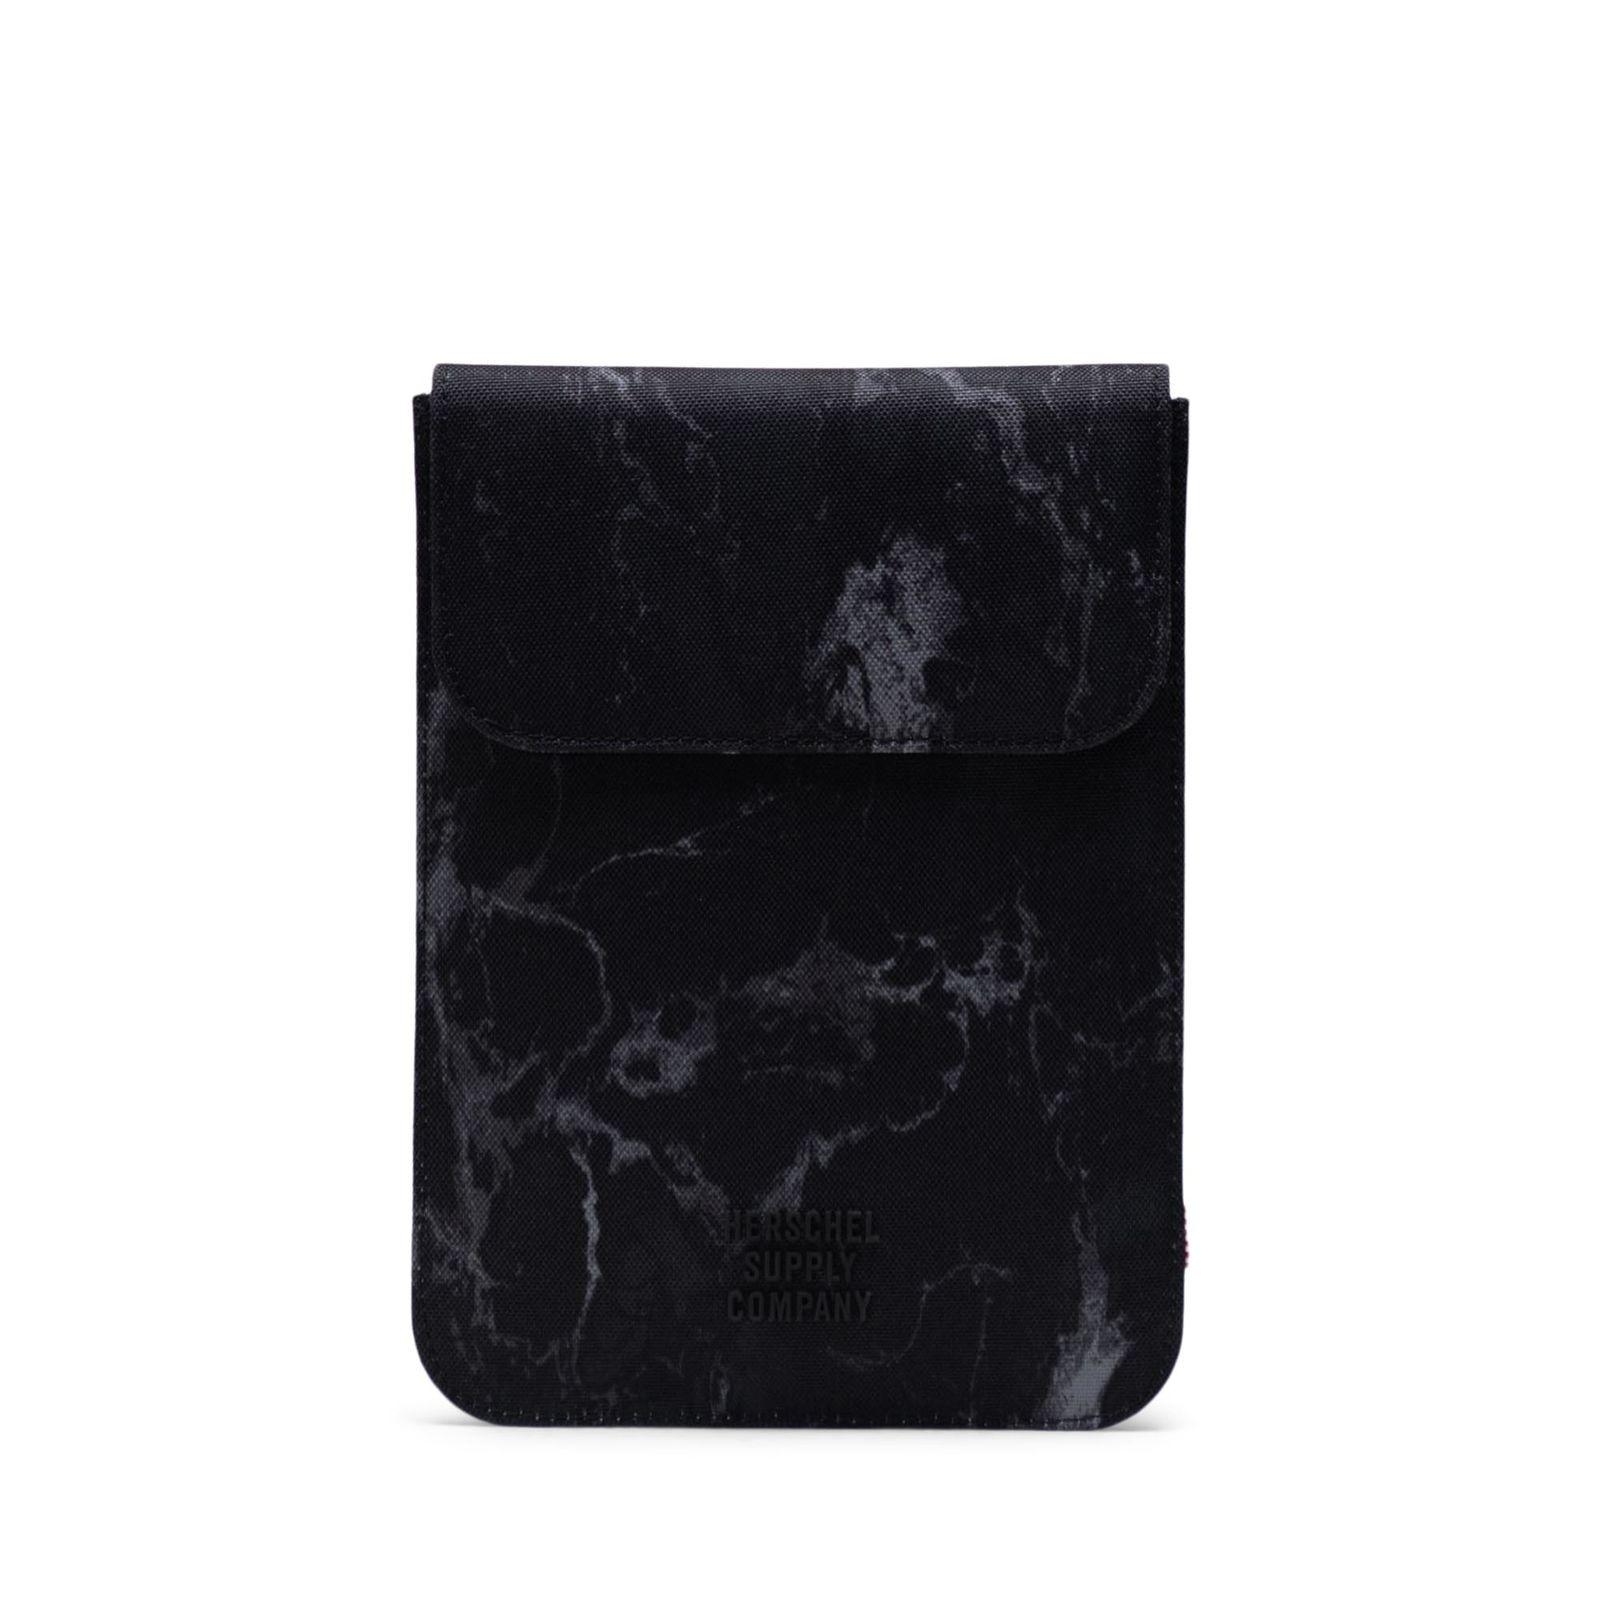 Herschel iPad Kılıfı Spokane Sleeve for iPad Mini Black Marble